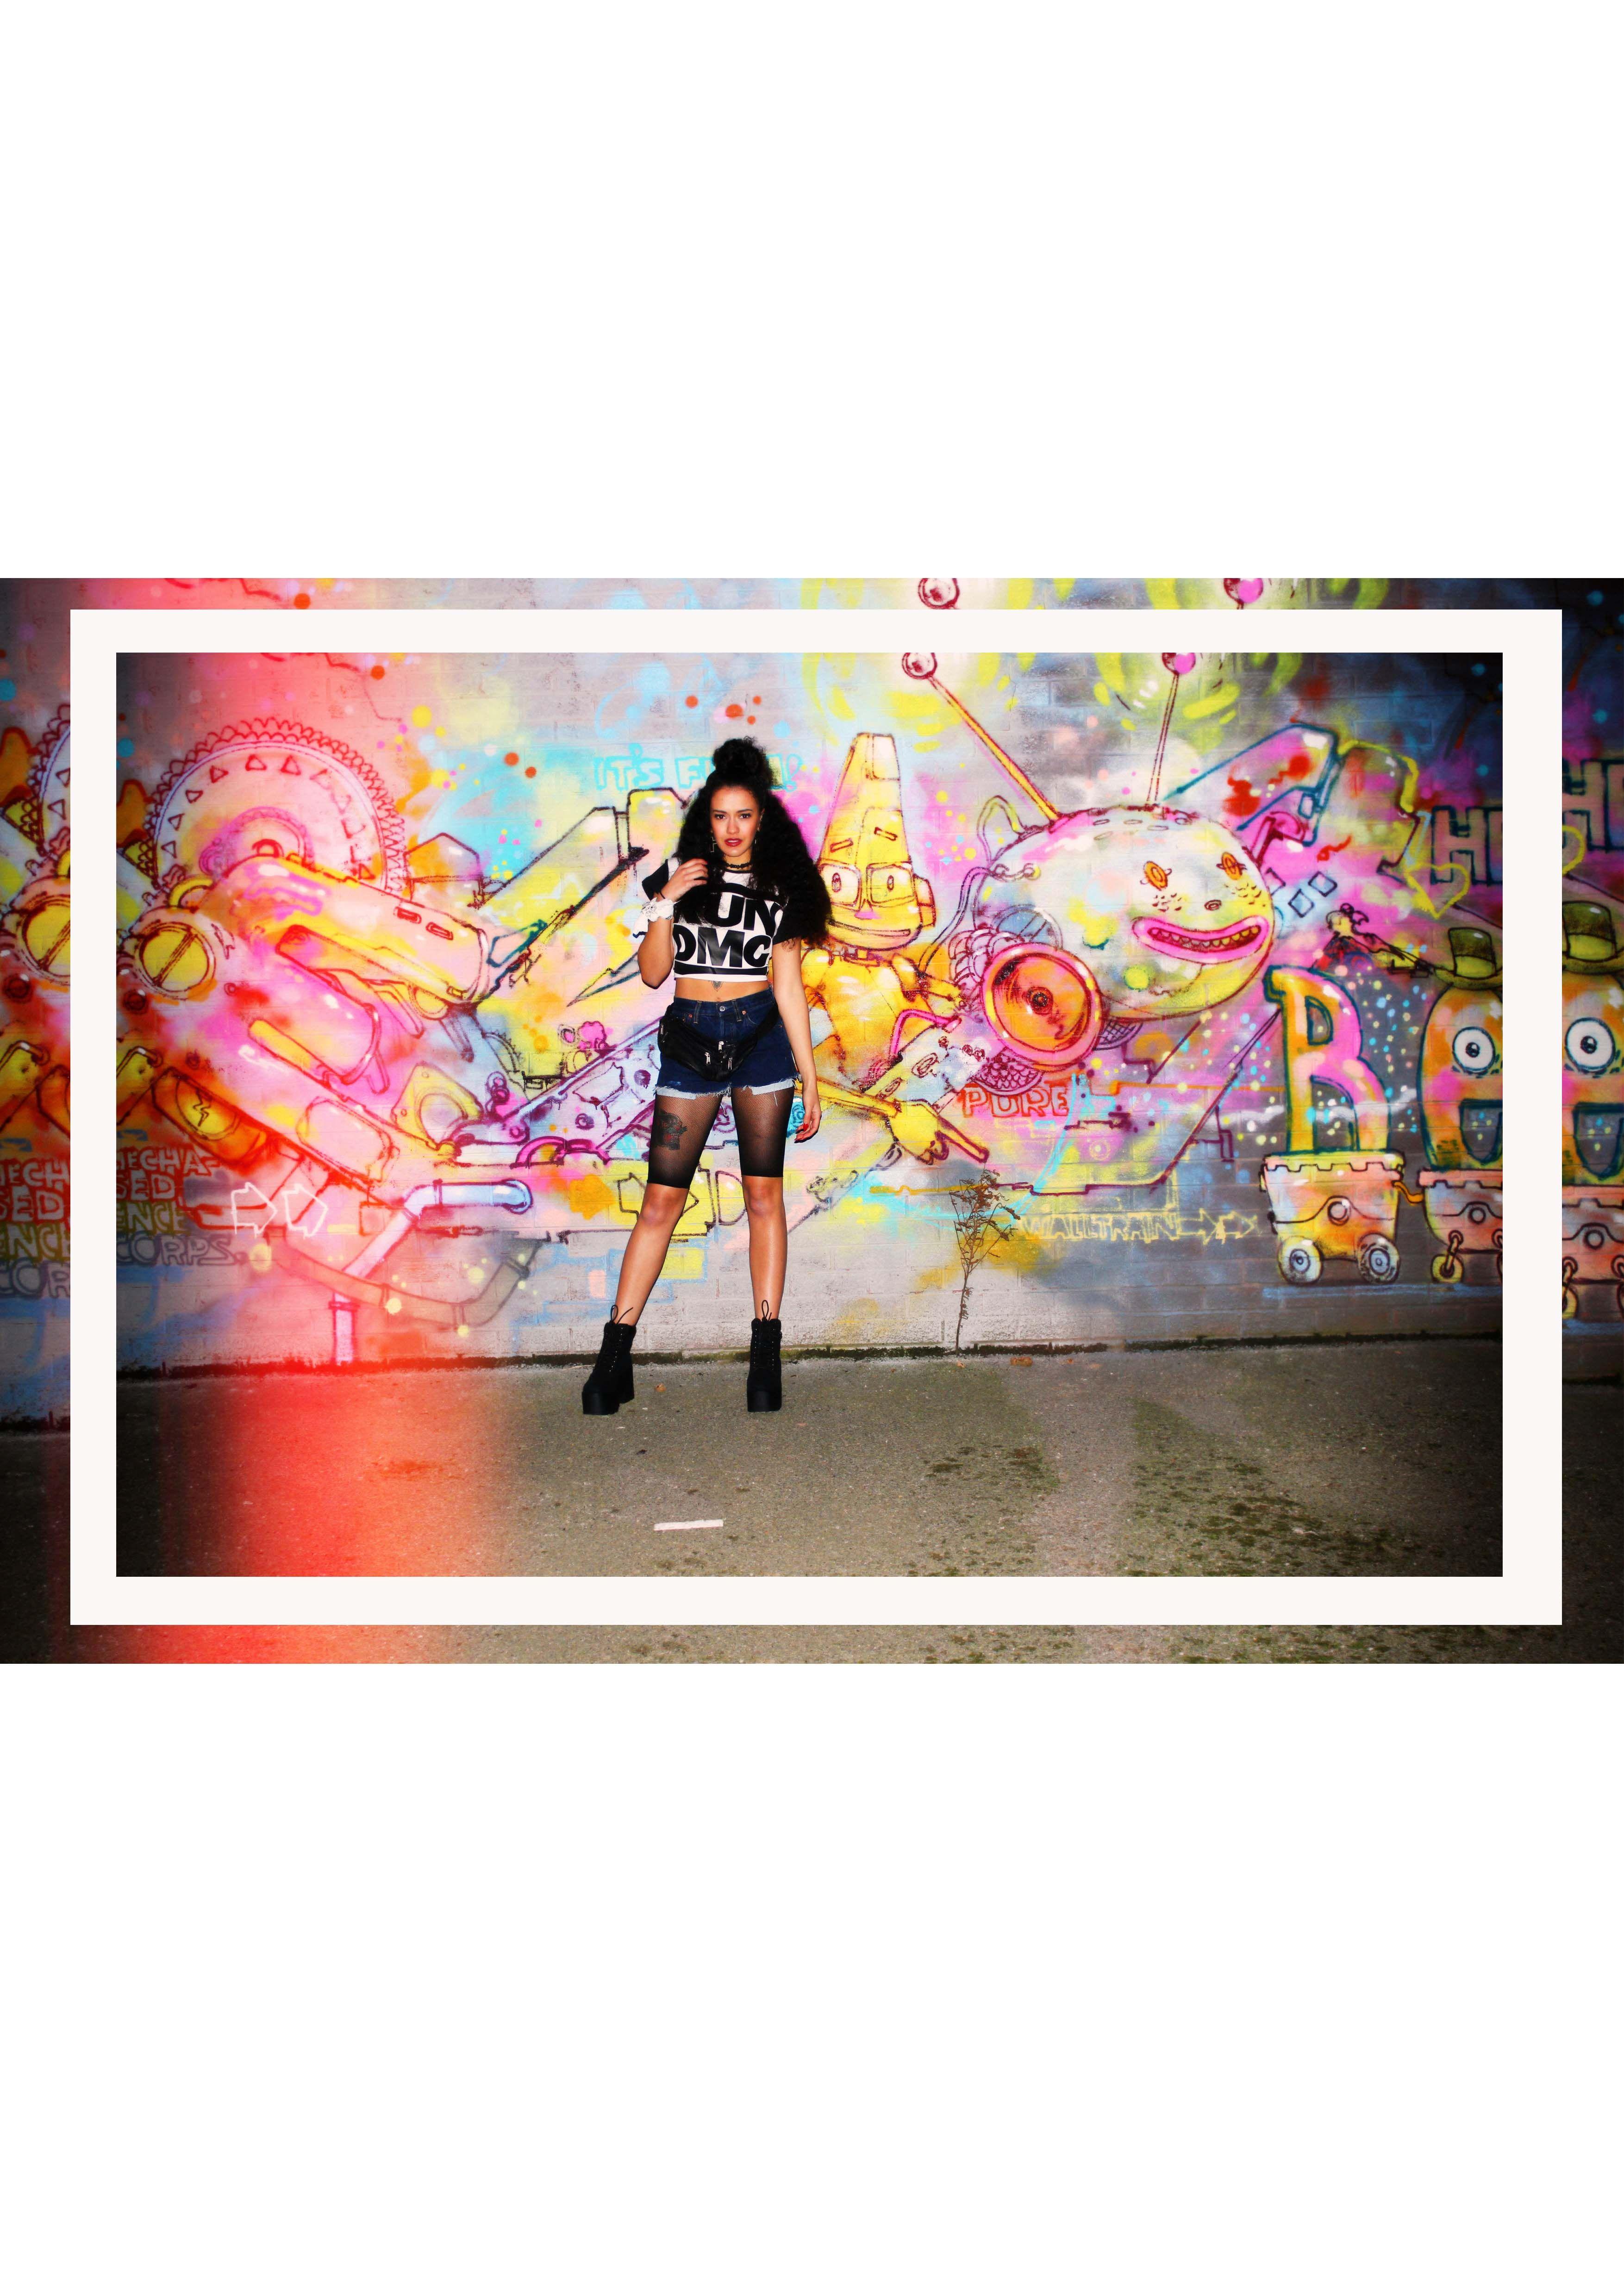 #Styling #Stylist #Photography #Editorial #Fashion #90s #Urban #photoshoot